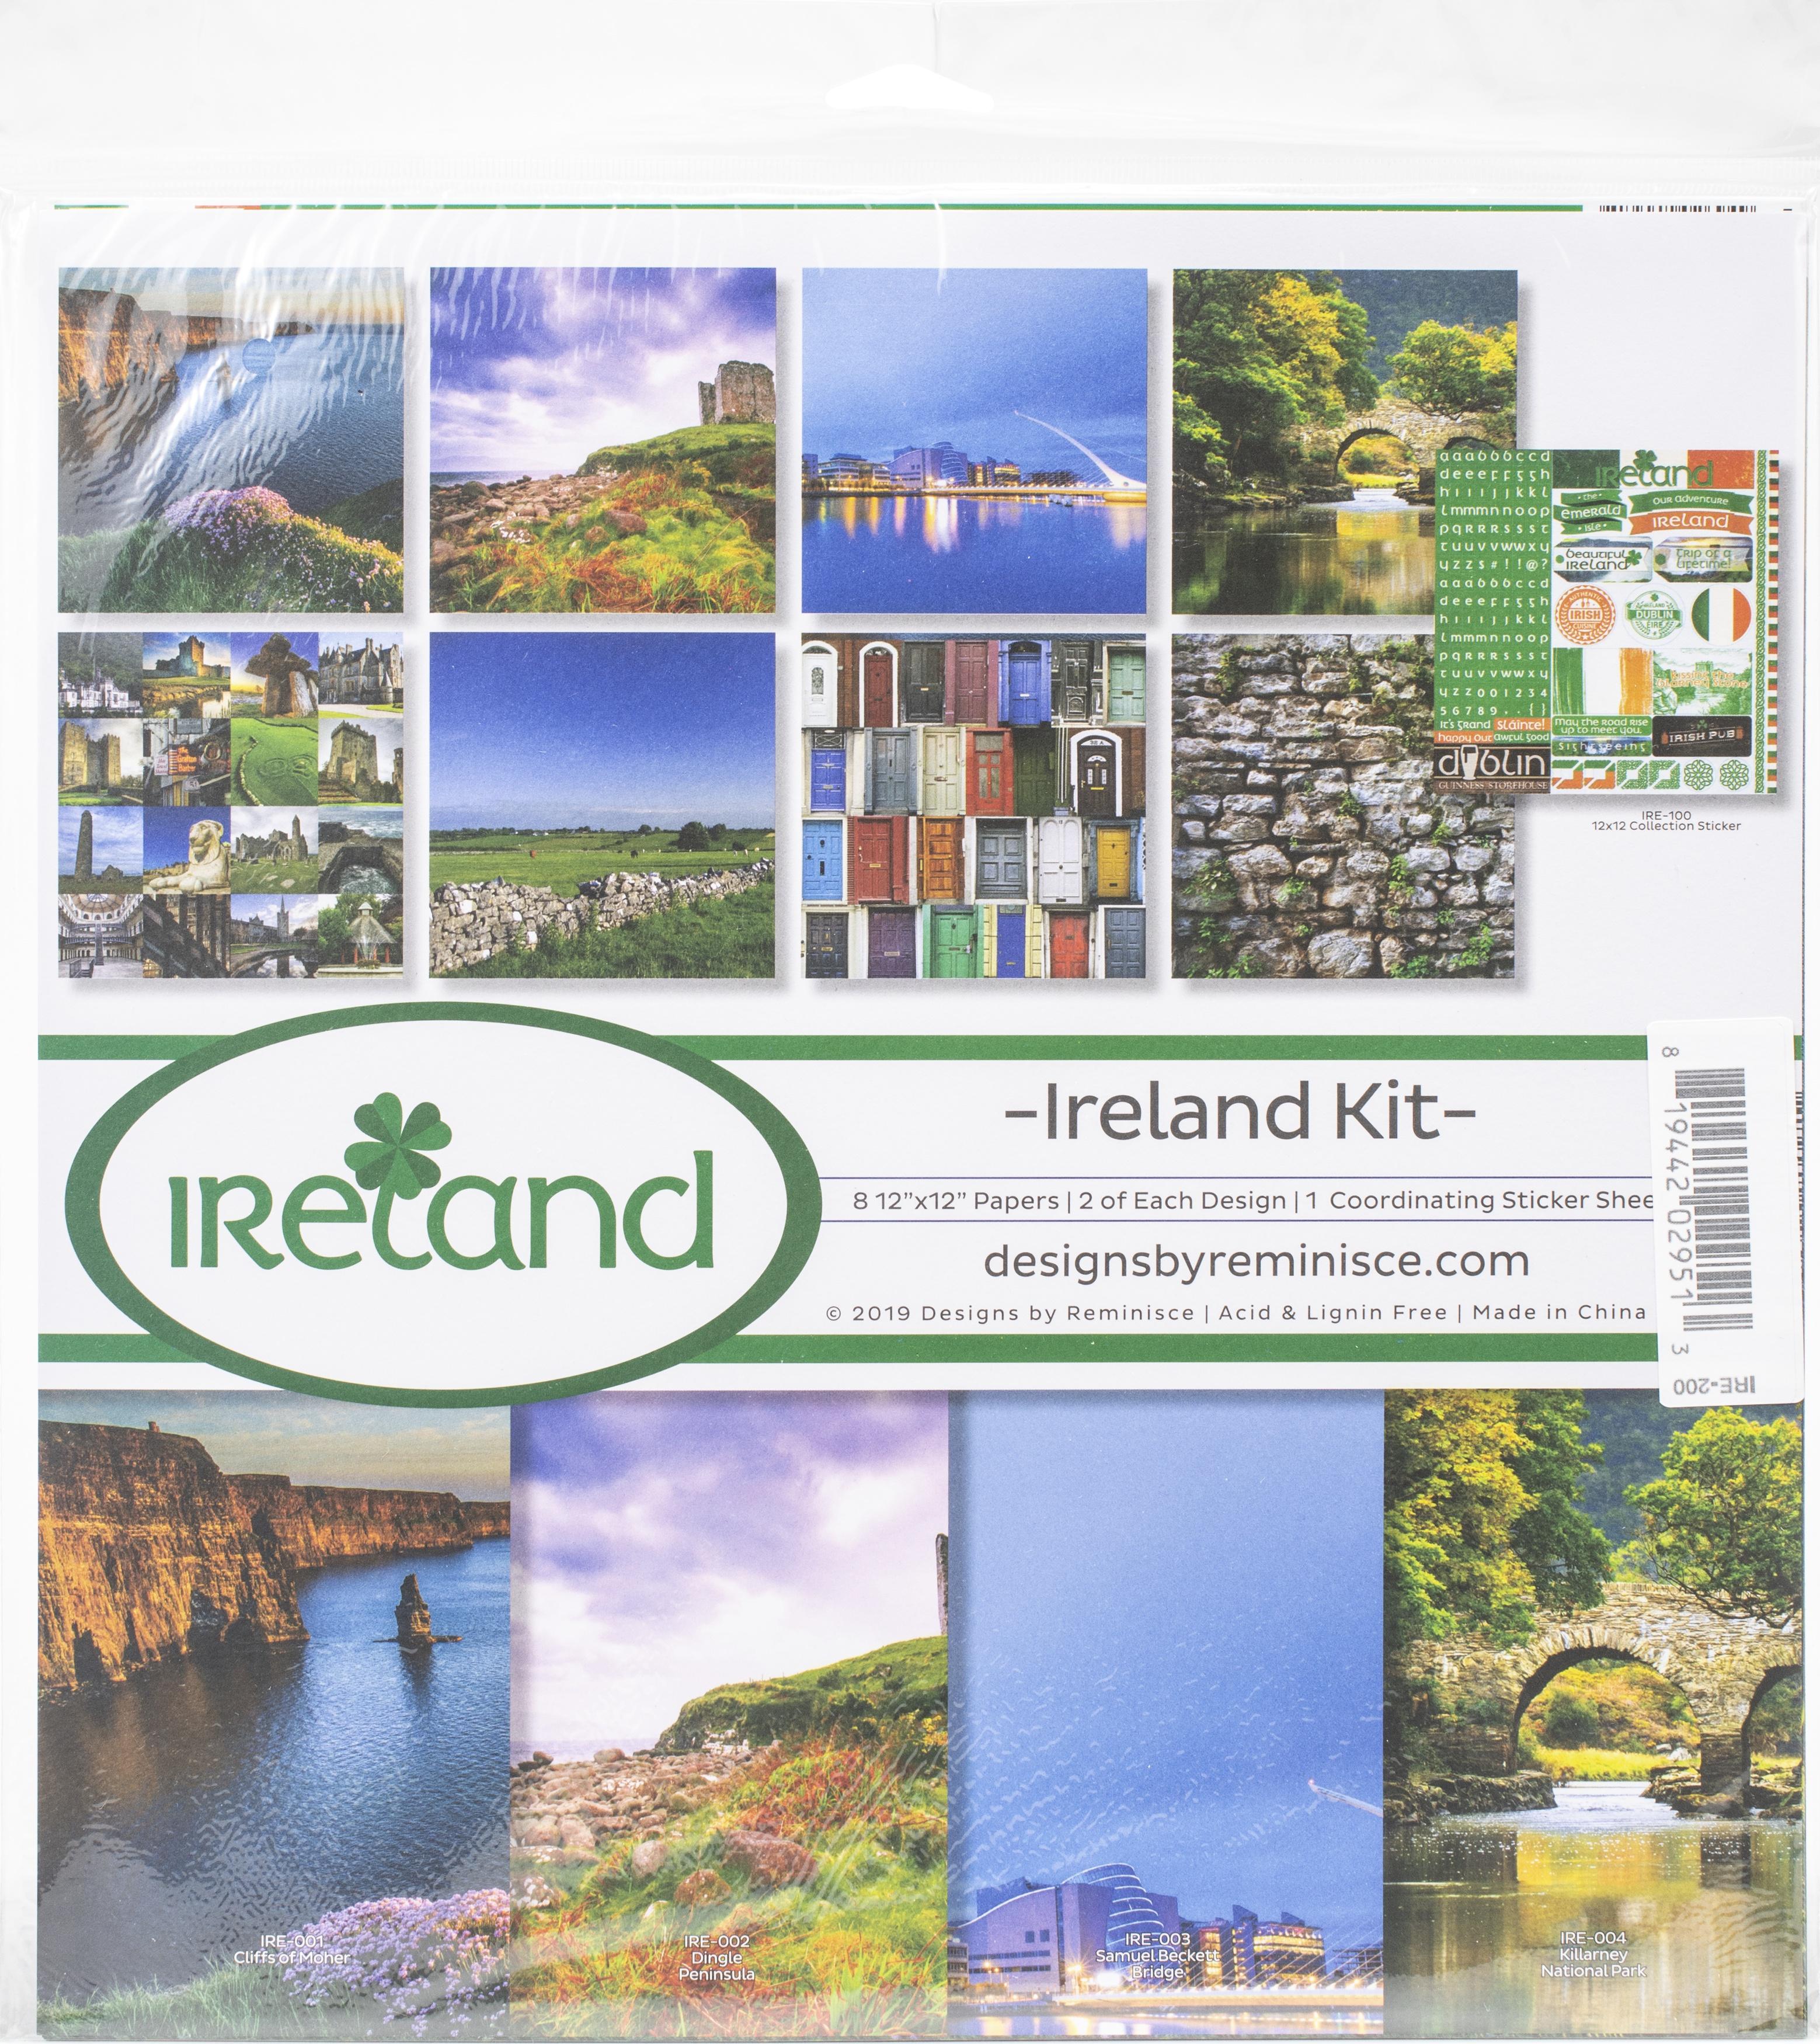 Reminisce Collection Kit 12X12 - Ireland